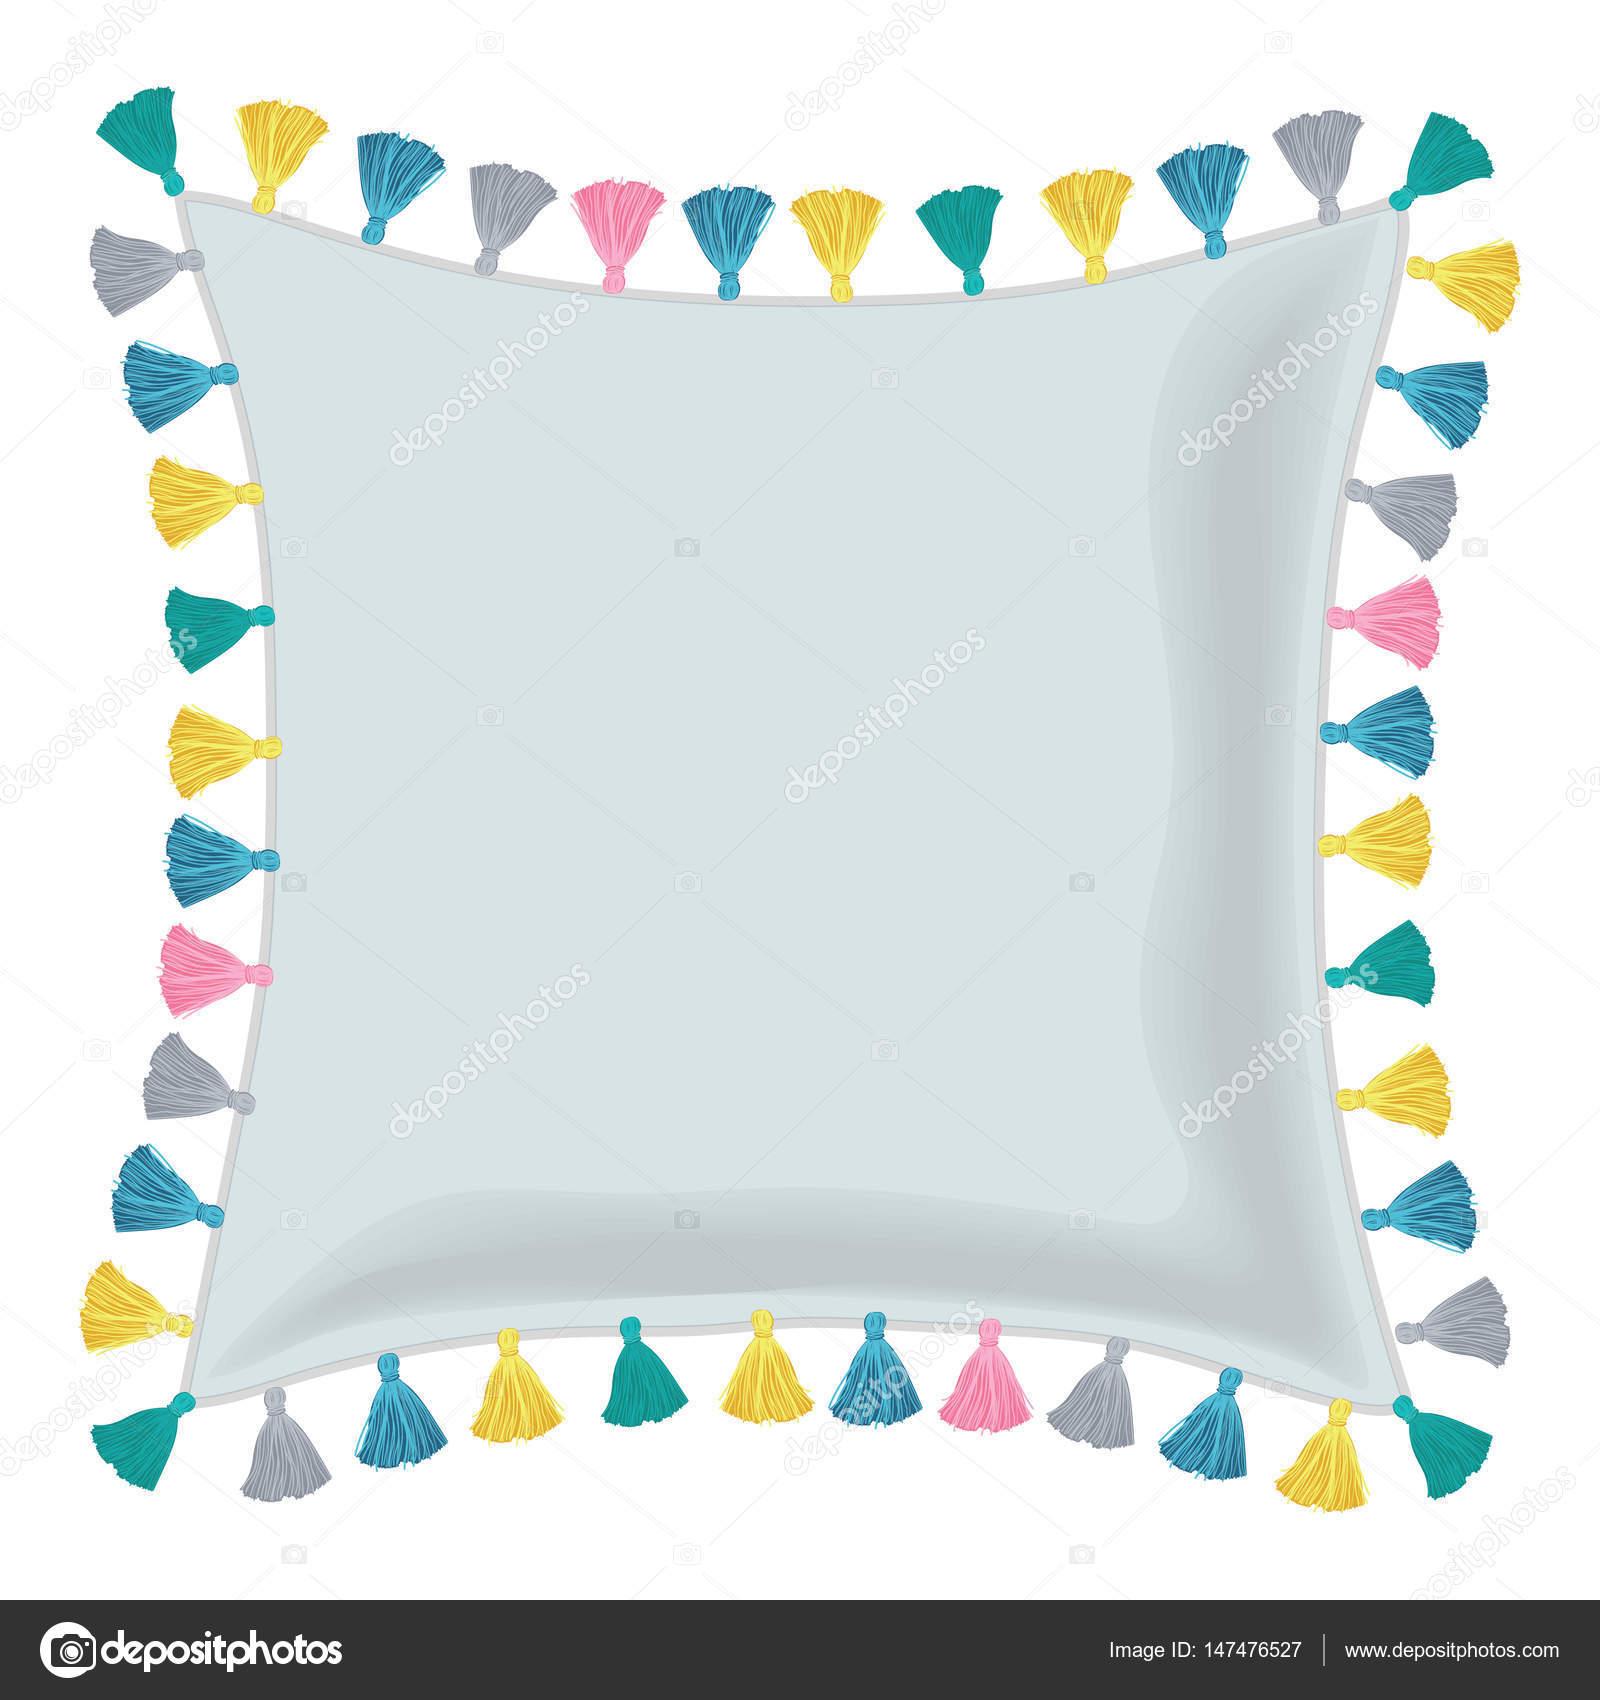 Vector gris almohada decorada con borlas decorativas coloridas ...